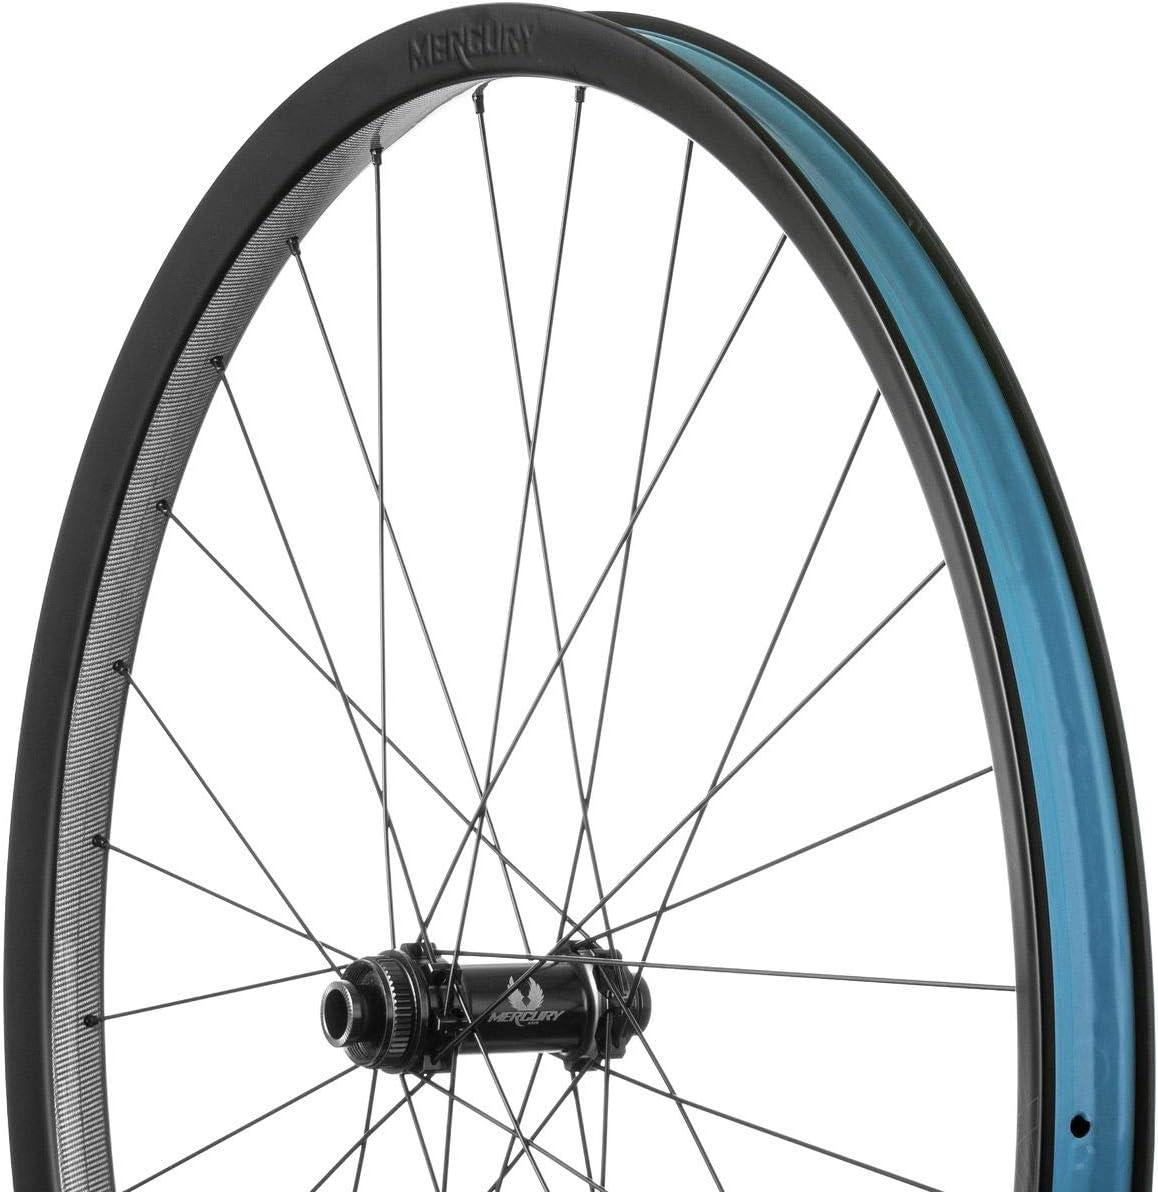 Mercury Wheels X1 Carbon Enduro 29in Boost Wheelset